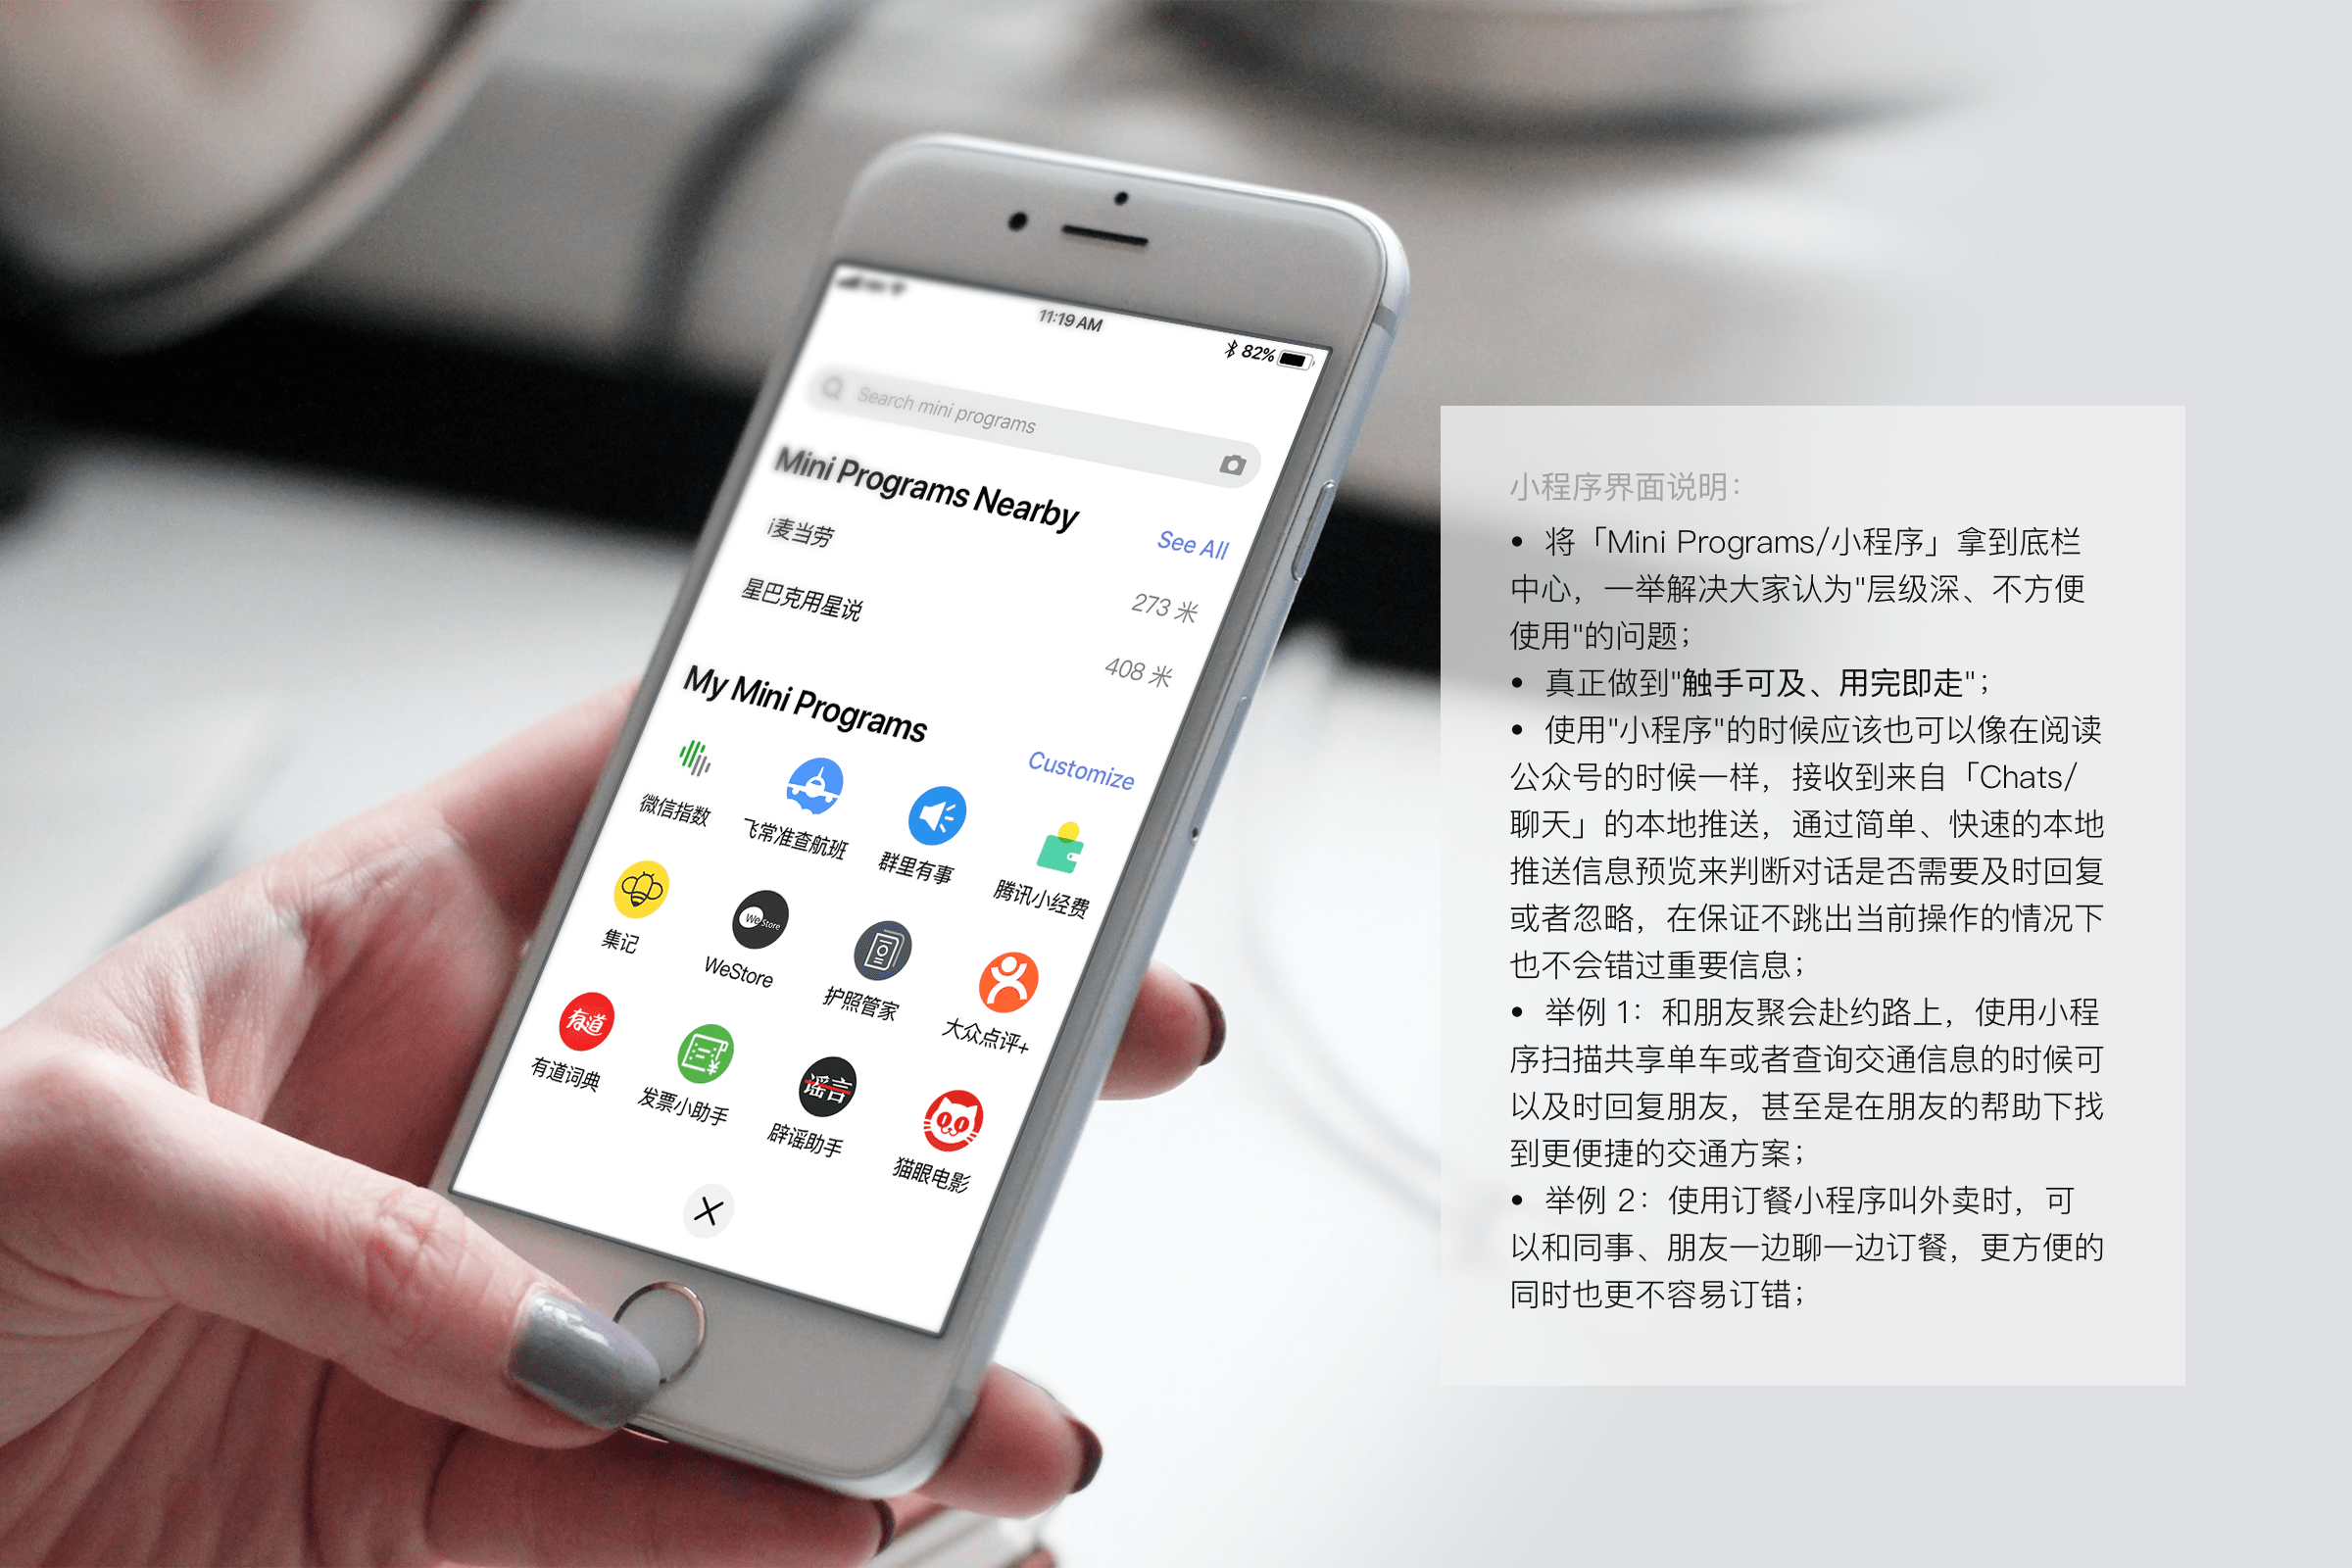 WeChat-Refresh-Part-6-Mini-Programs-min.png